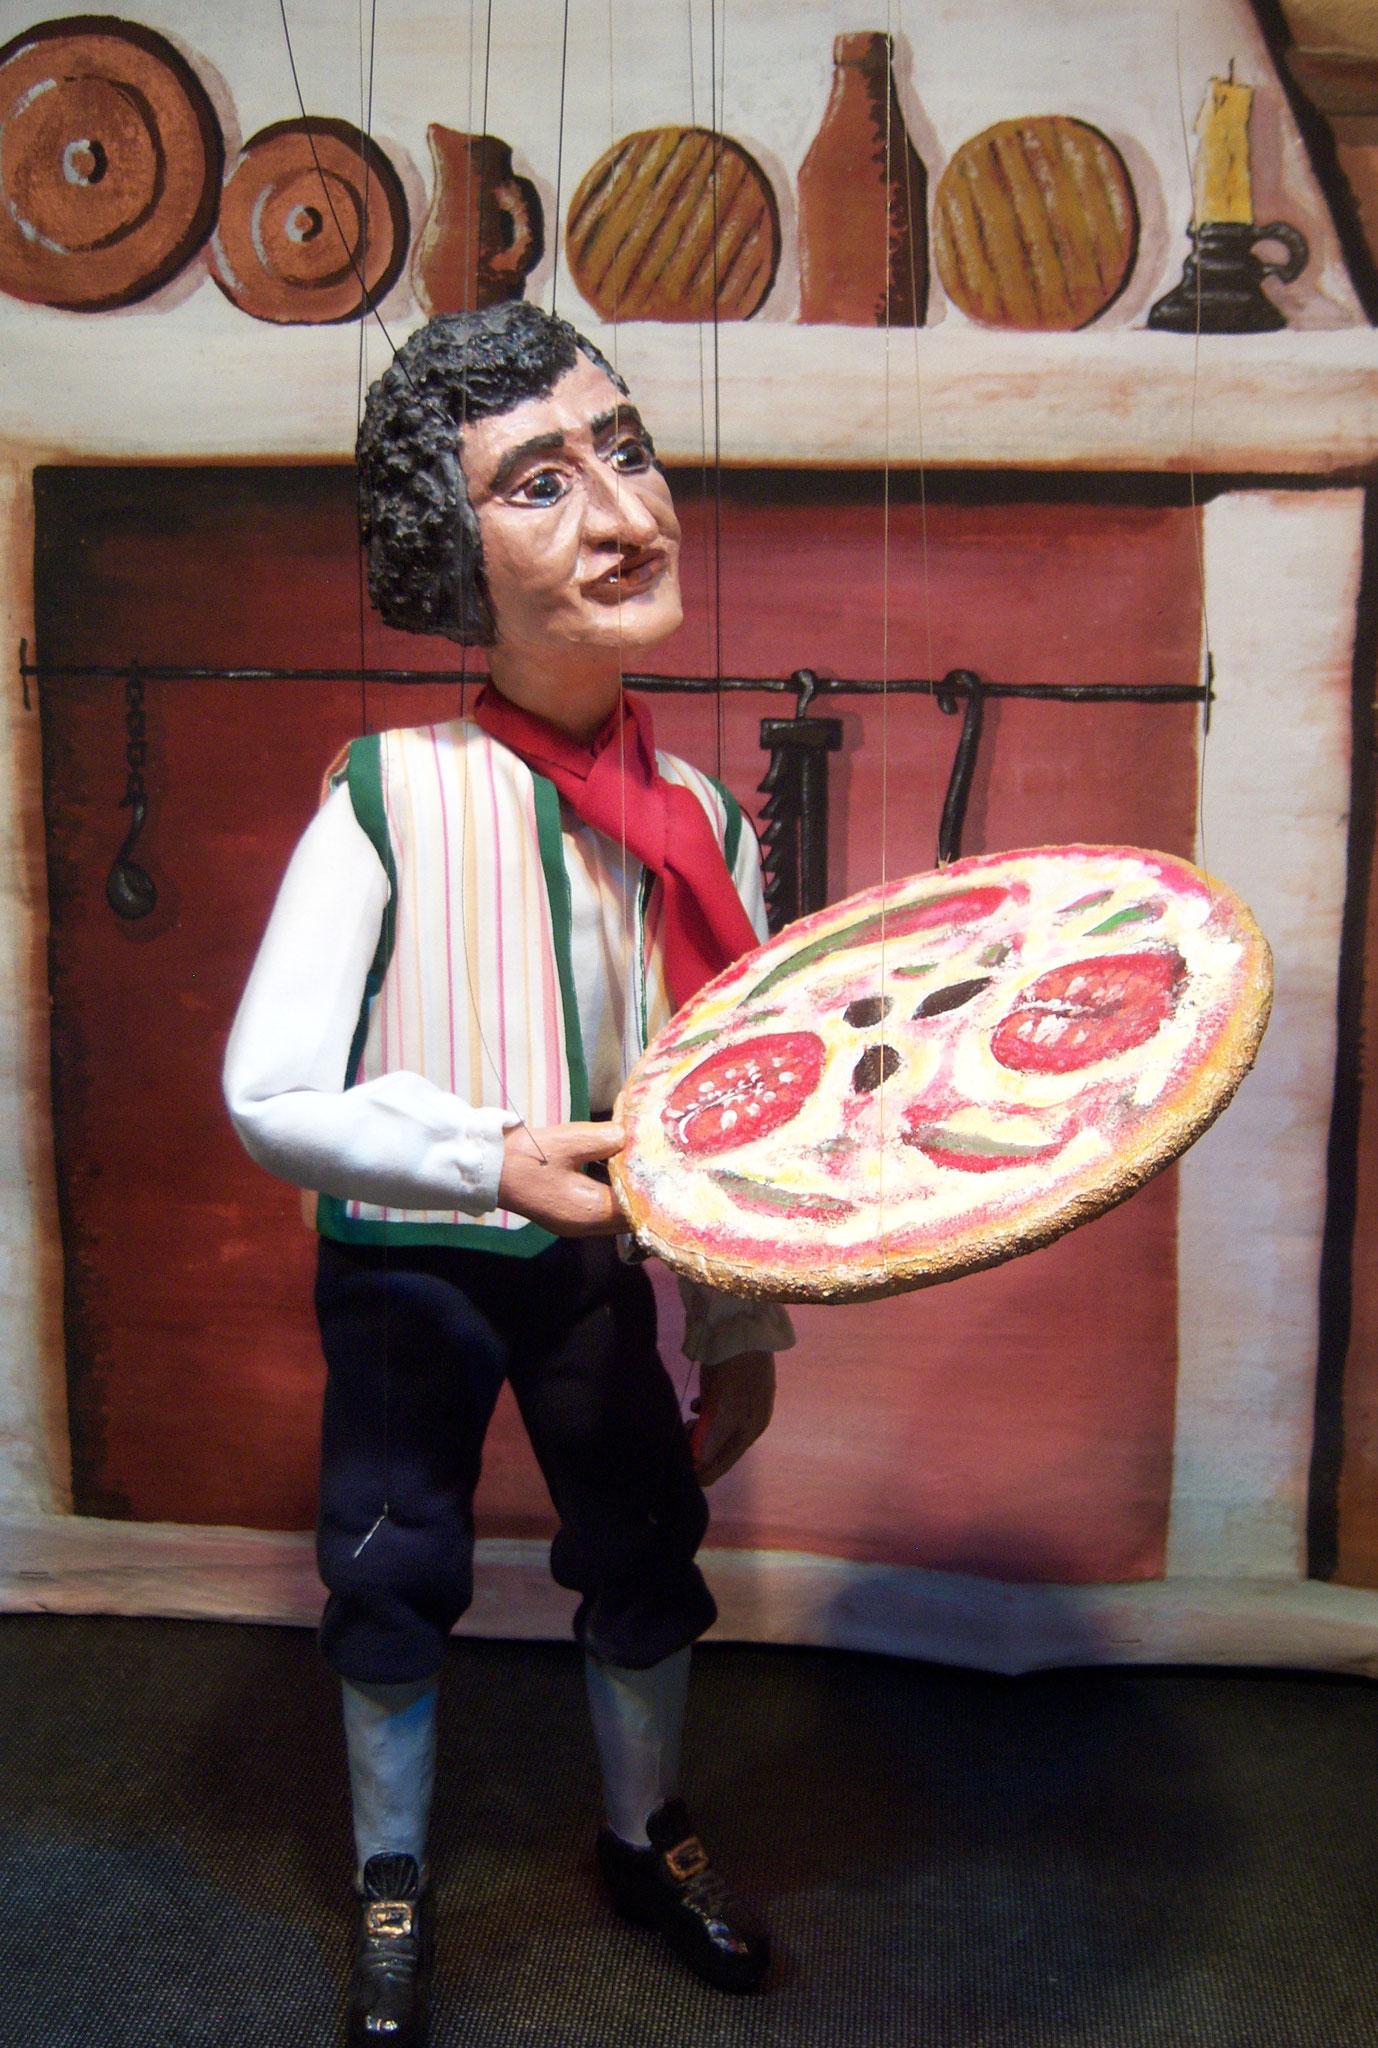 Angelo mit der Pizza Diavolo